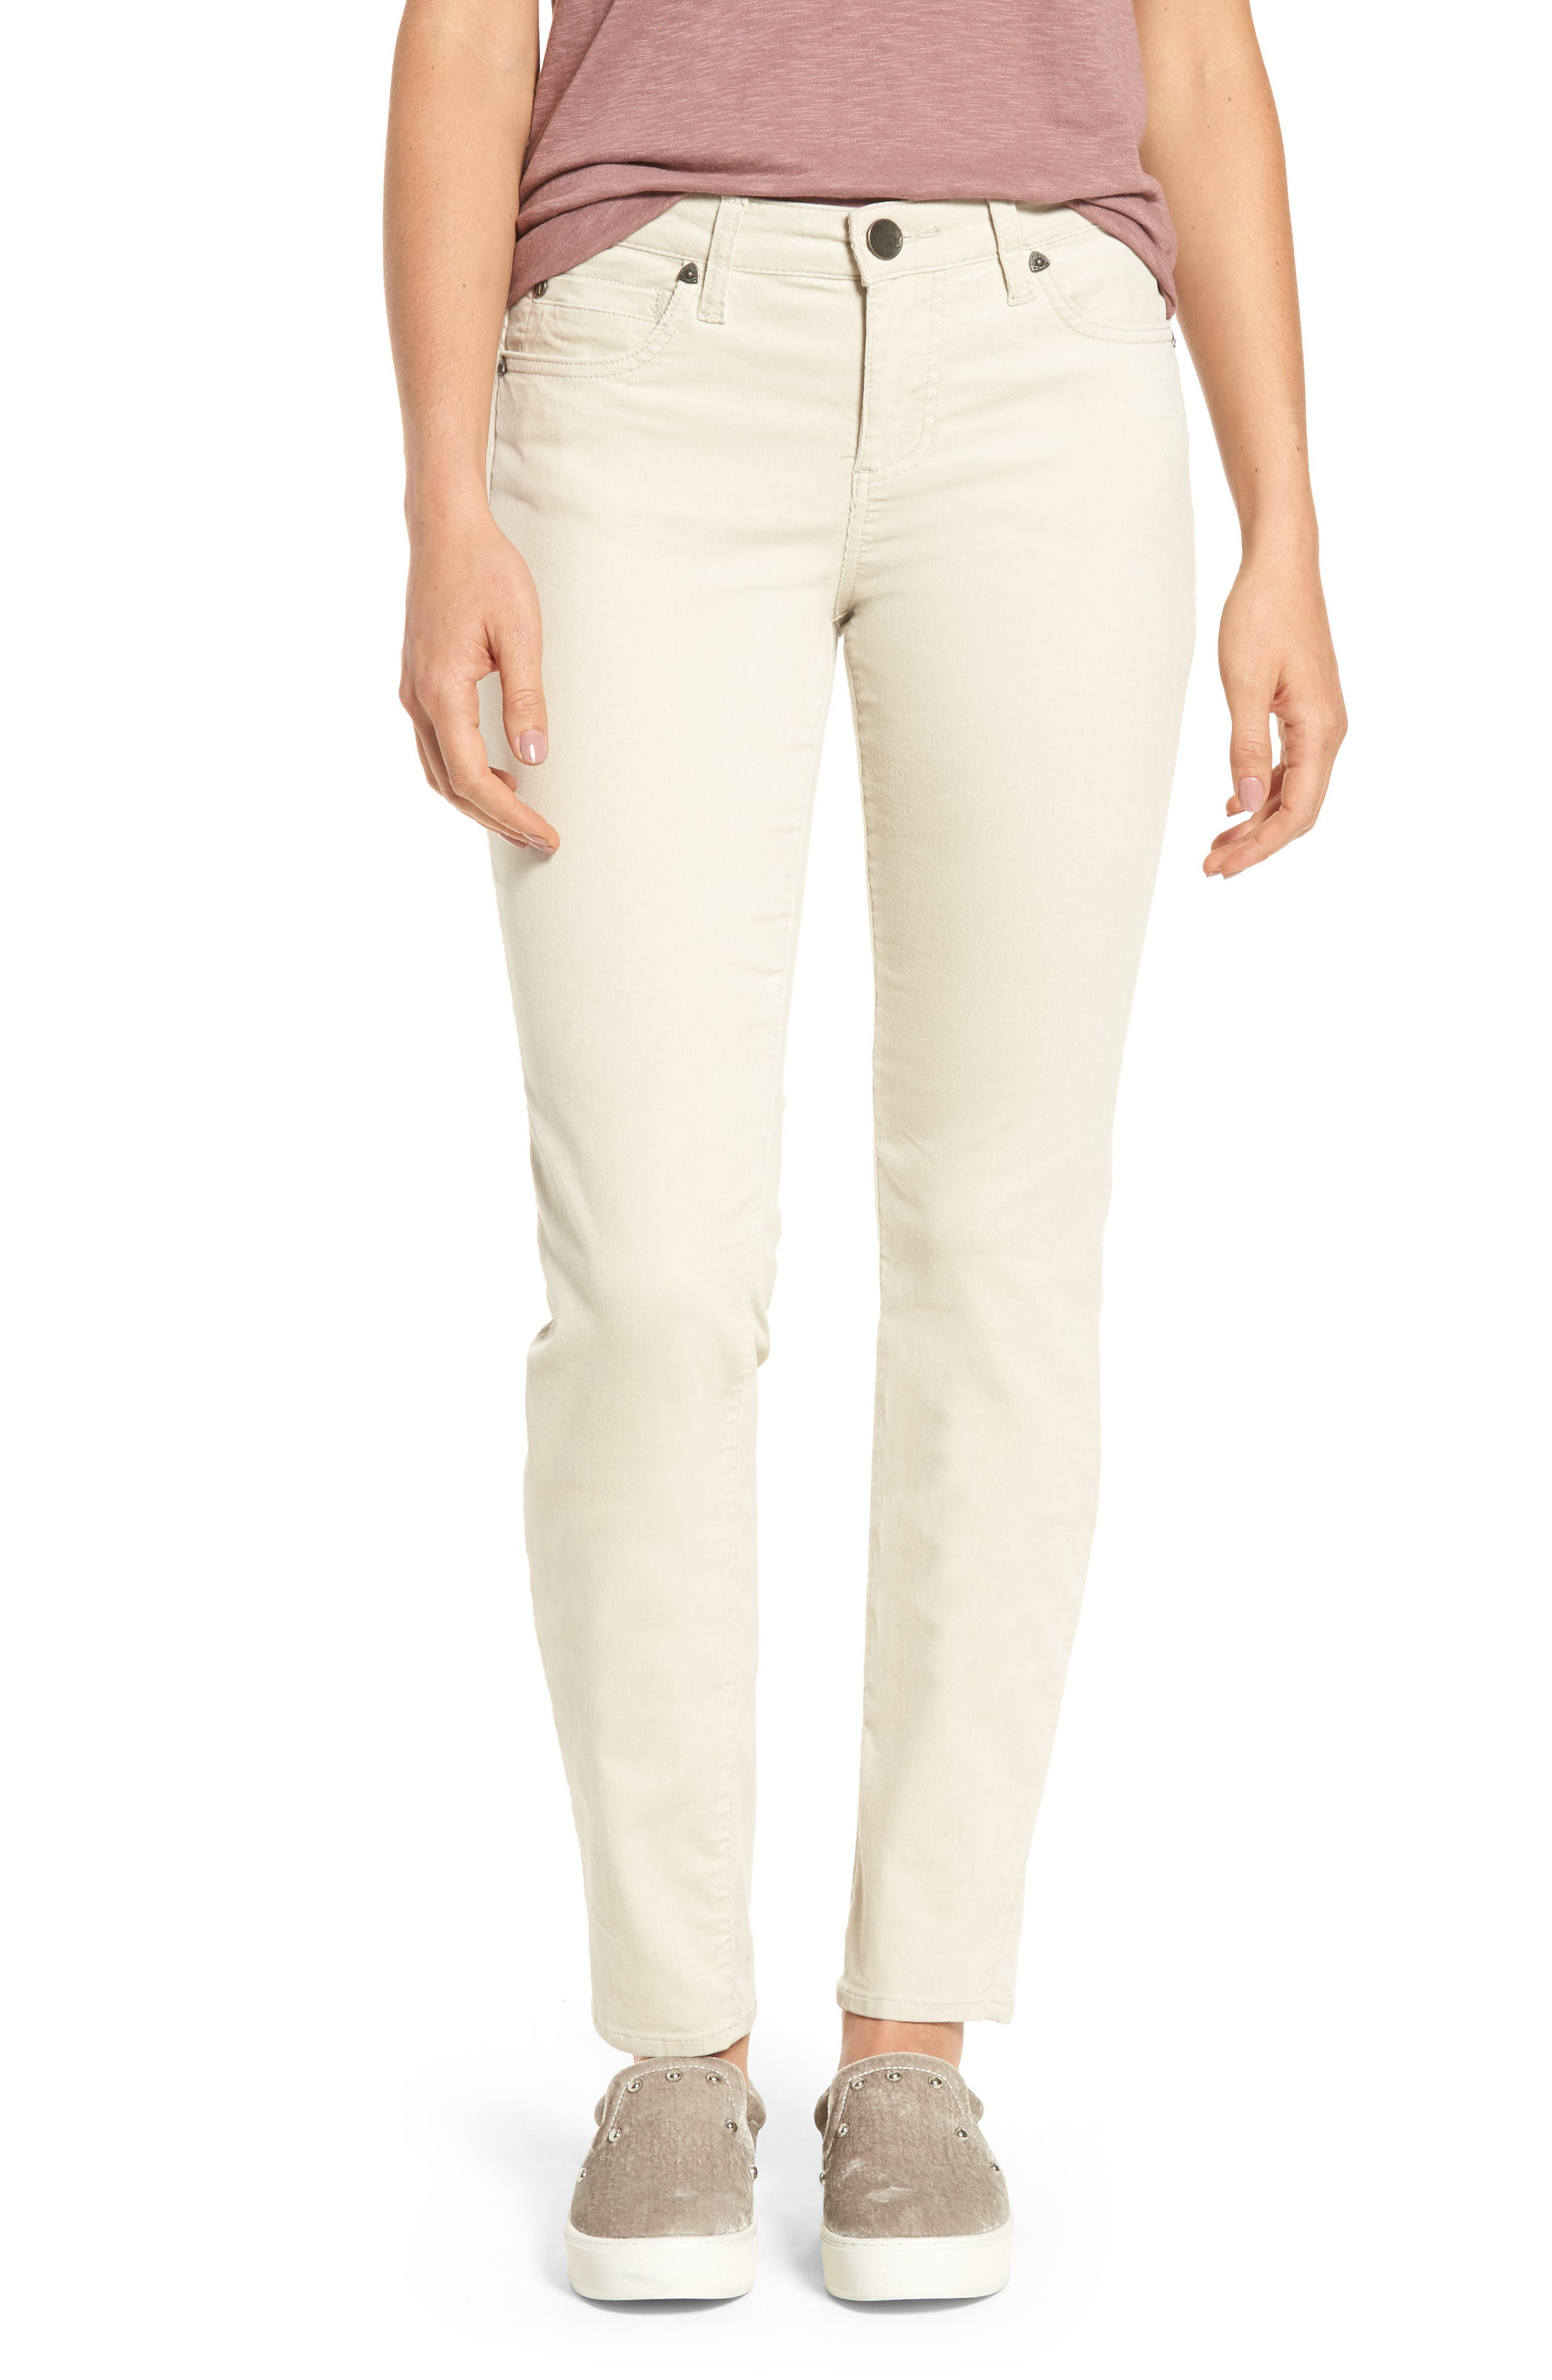 Diana Stretch Corduroy Skinny Pants,                         Main,                         color, Light Tan 2